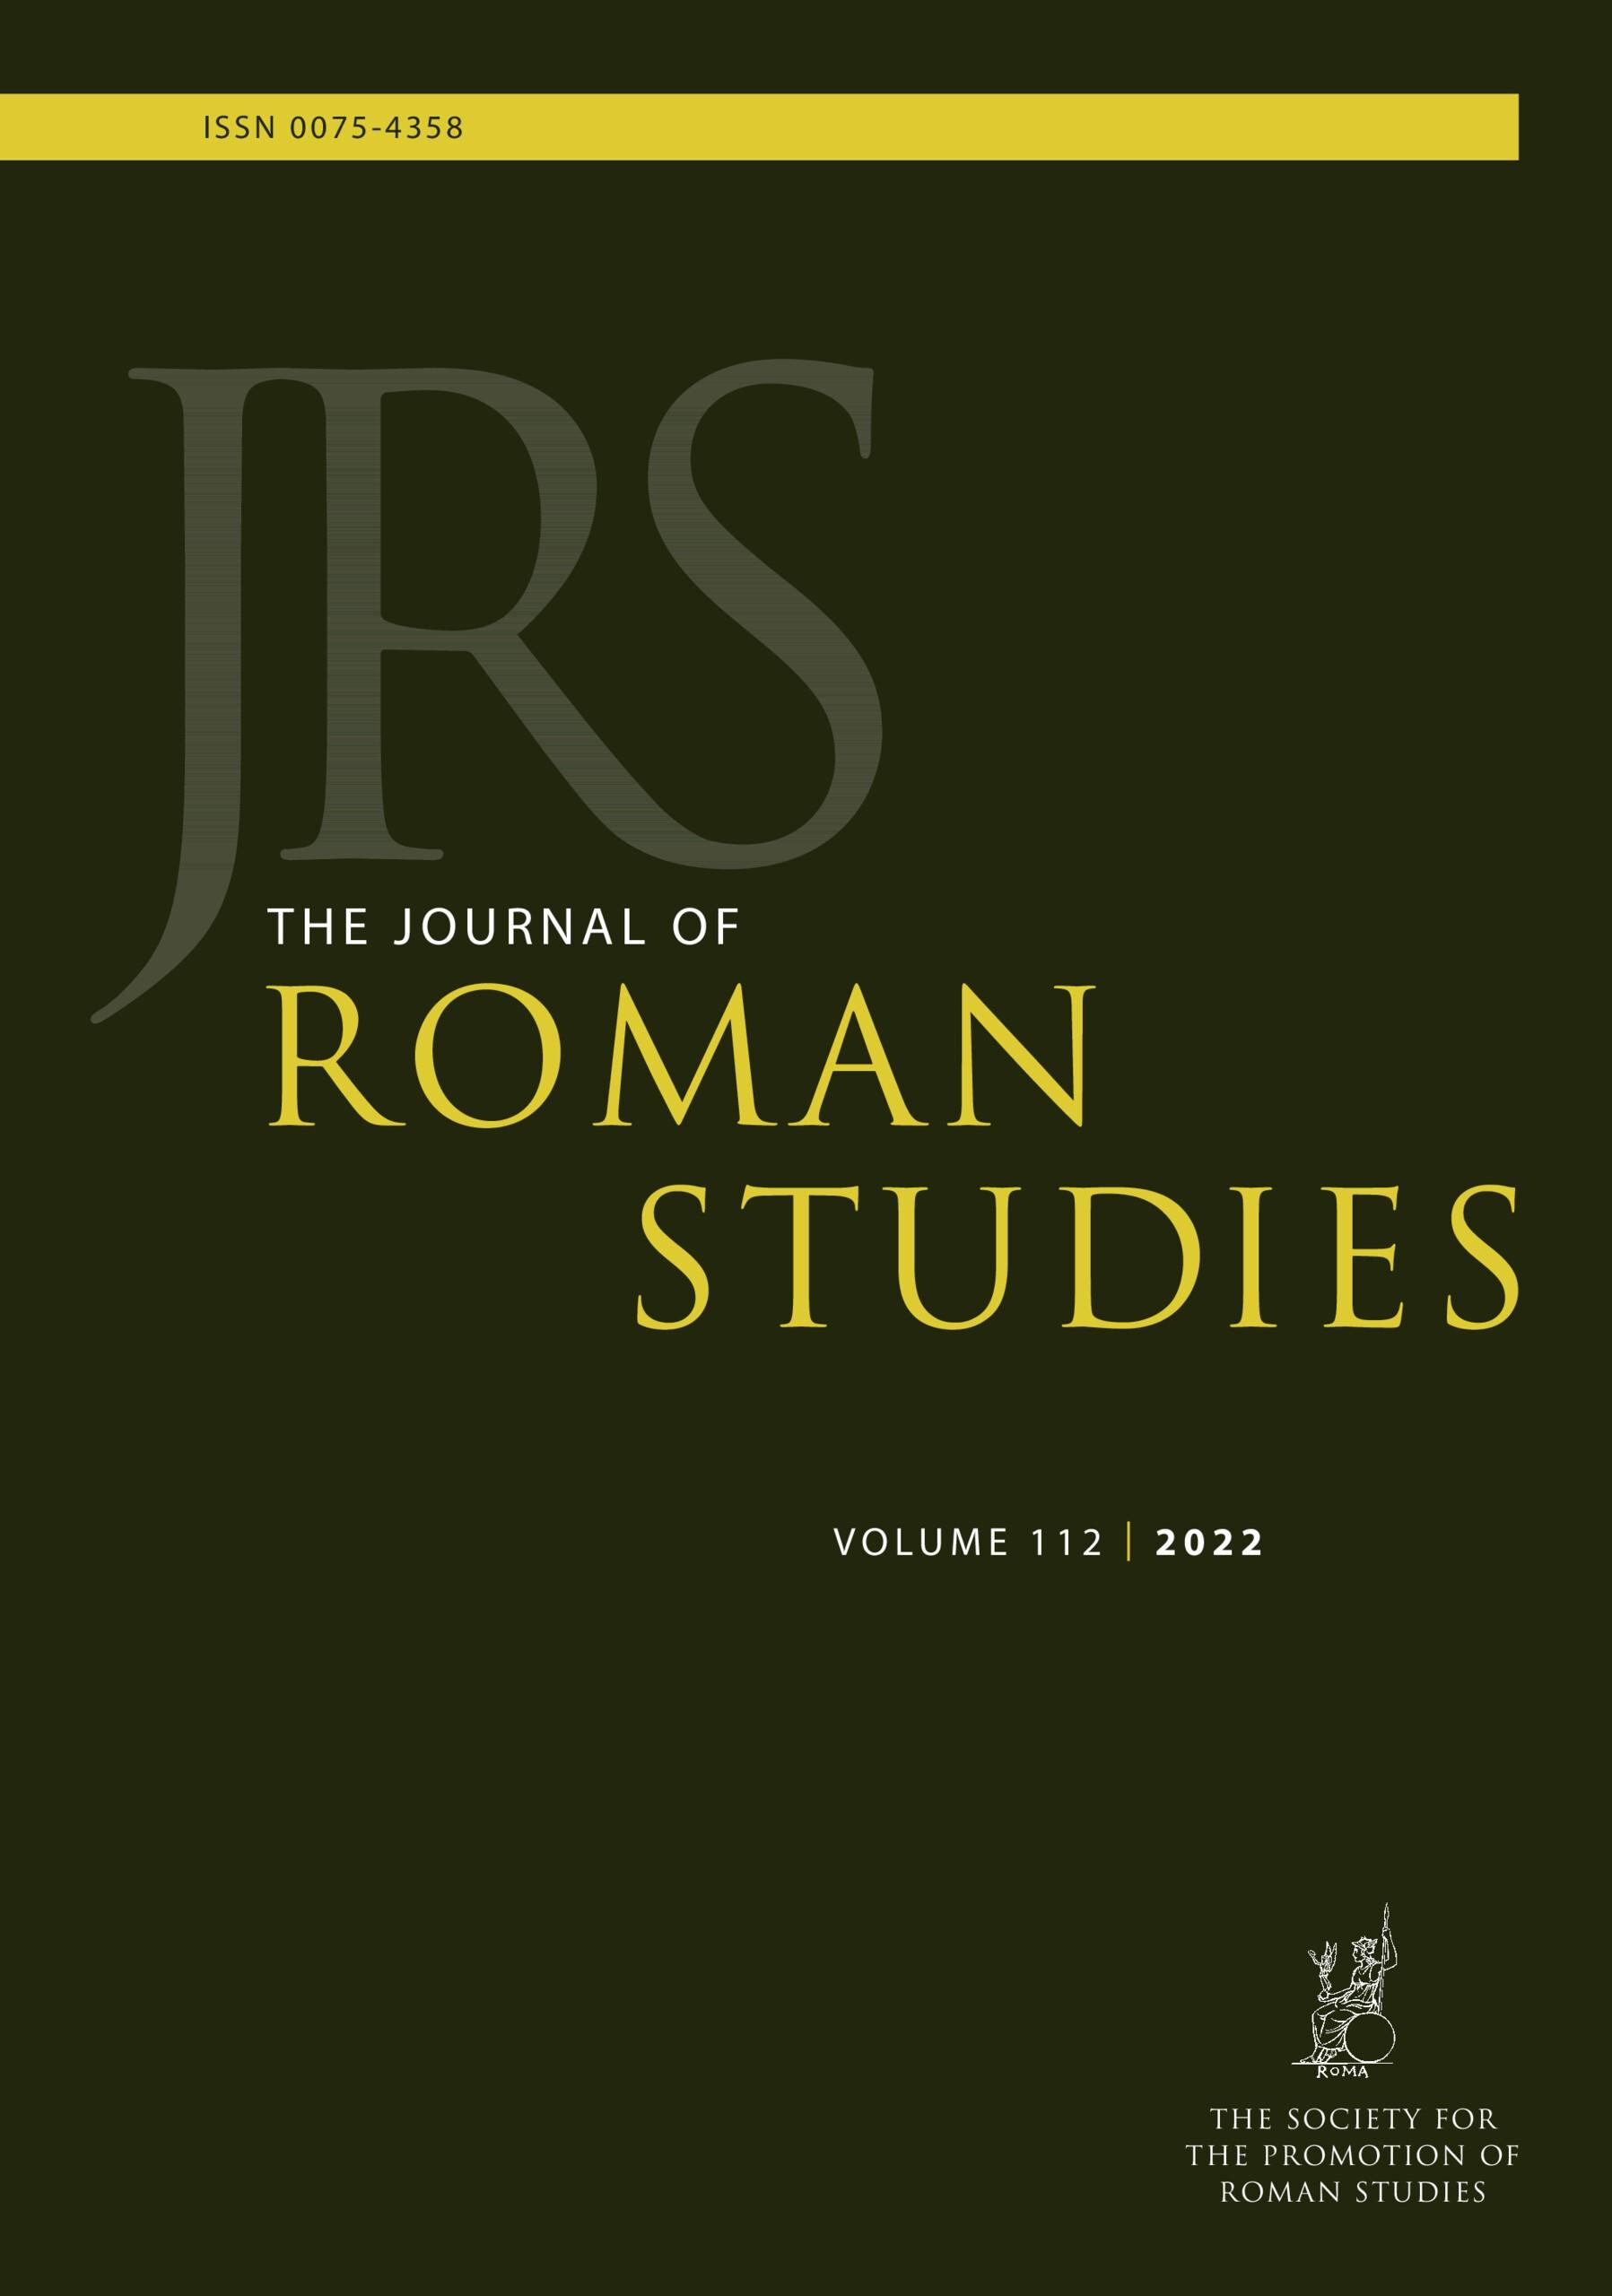 The Journal of Roman Studies